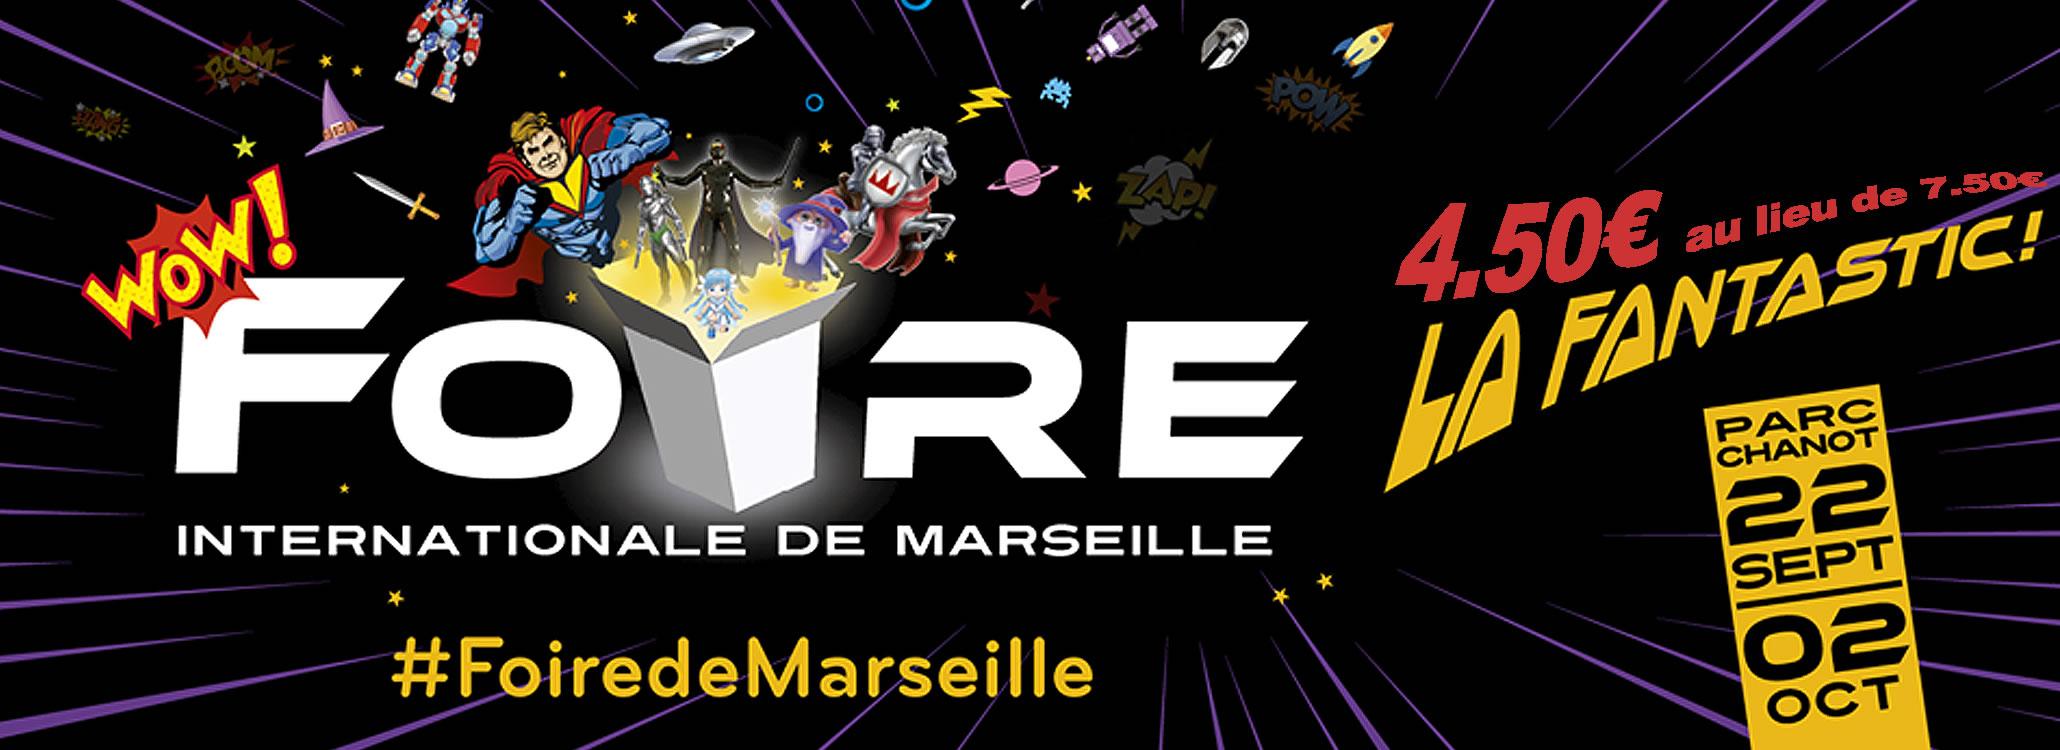 diaporama-INDEX-FOIRE-DE-MARSEILLE-2017